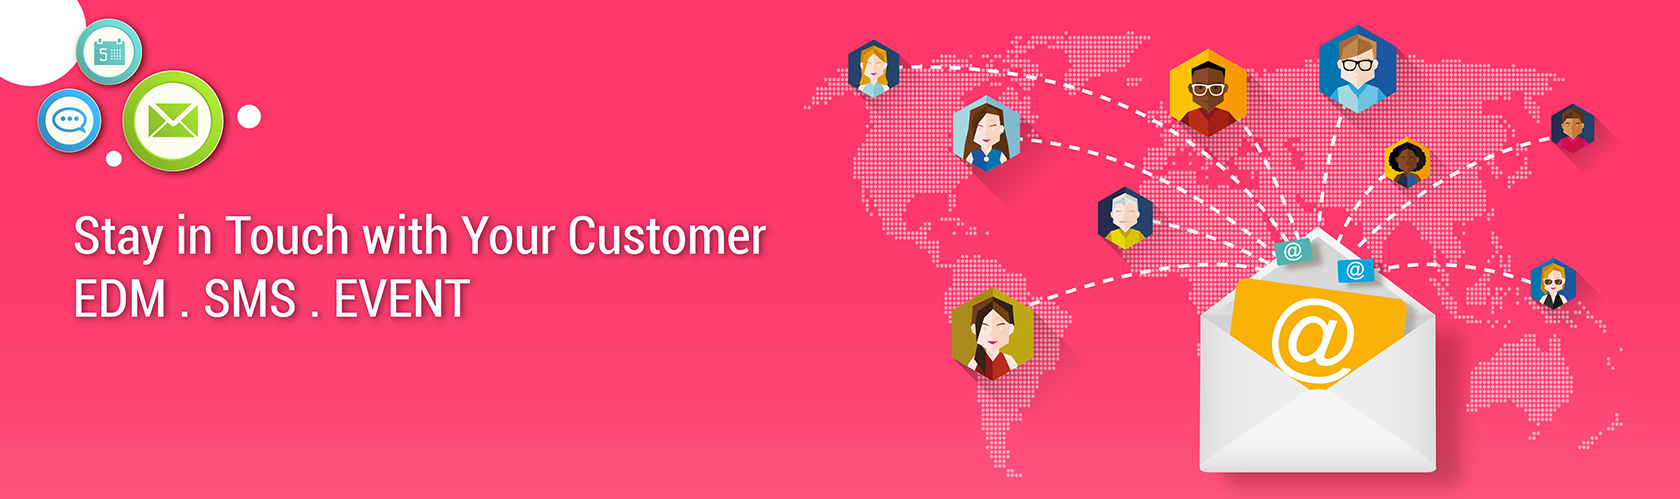 Customer_BANNER-021_1680